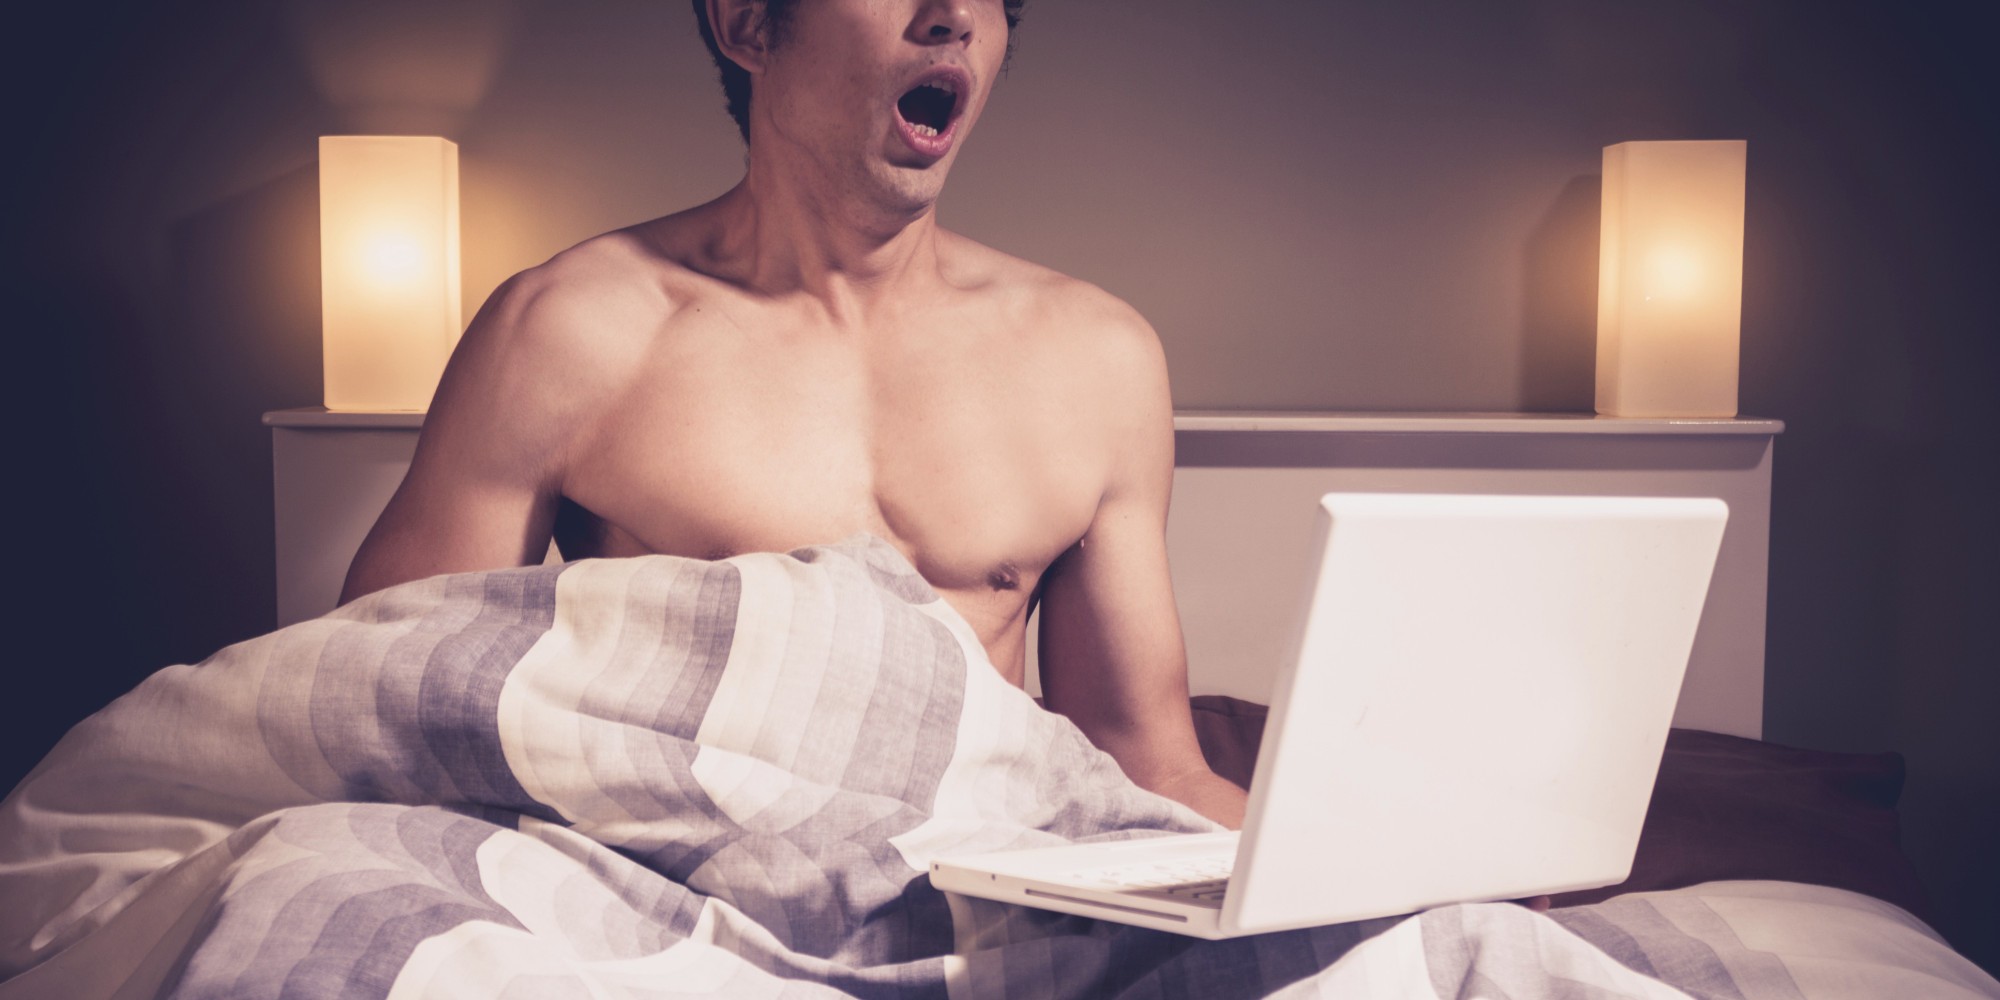 Porno et vidéo en ligne